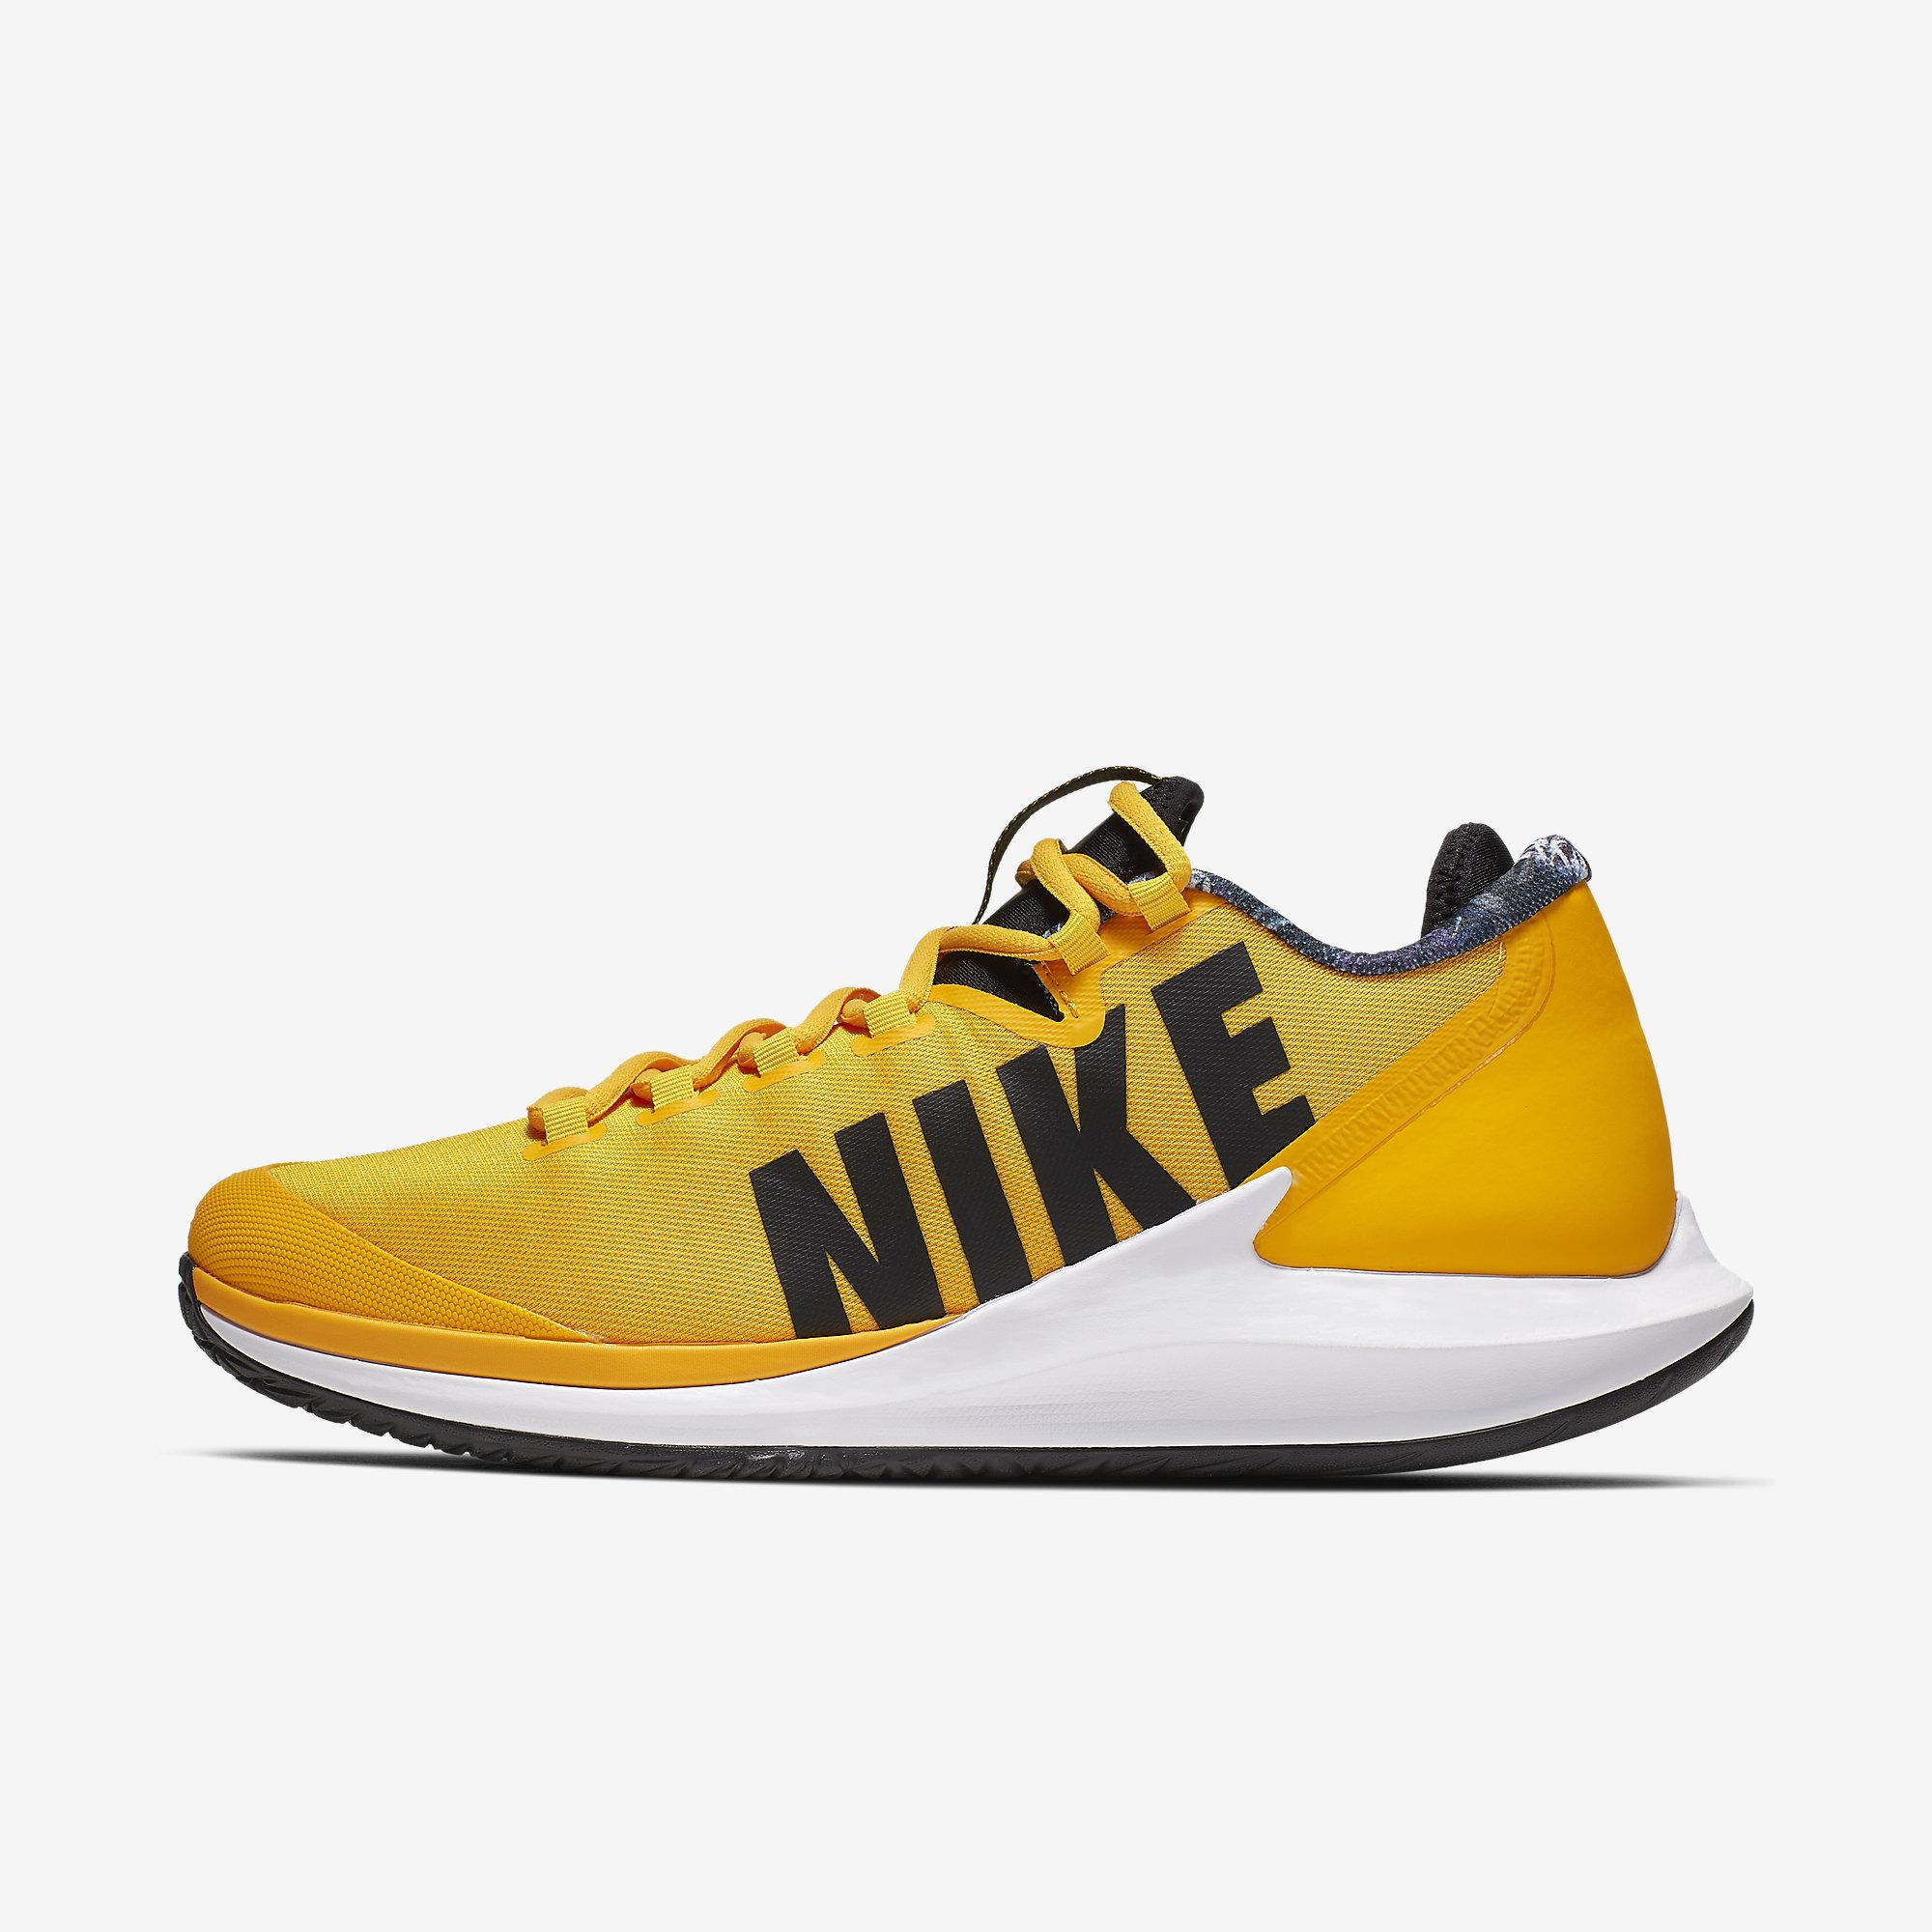 mens gold tennis shoes cheap online